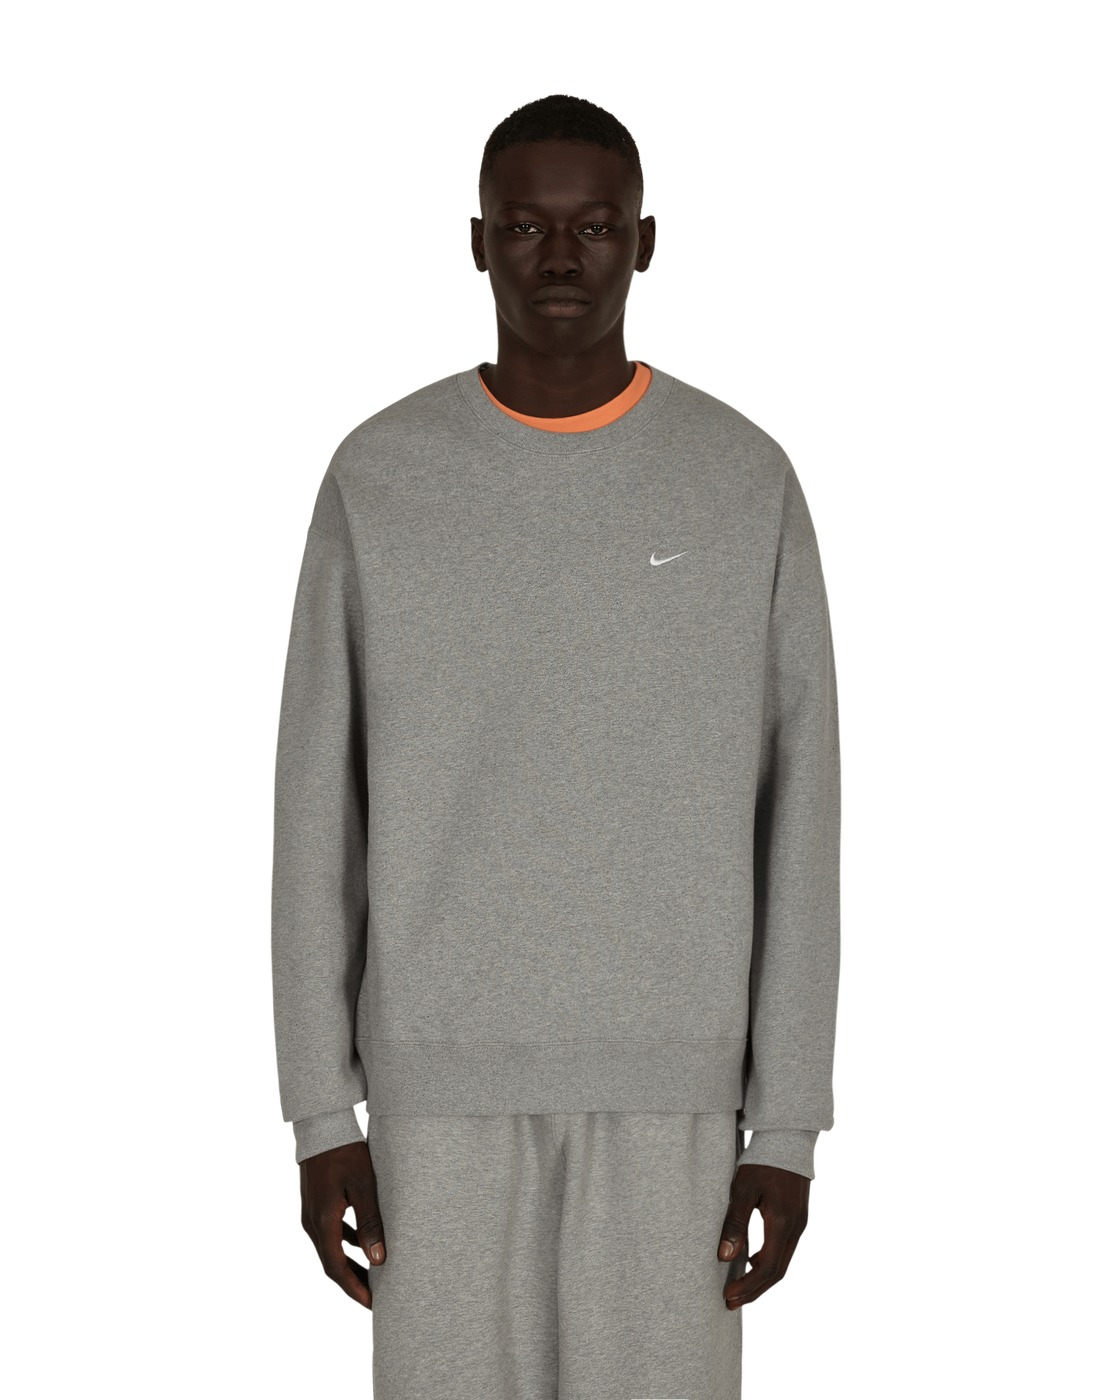 Nike Special Project Solo Swoosh Crewneck Sweatshirt Dk Grey Heather/White